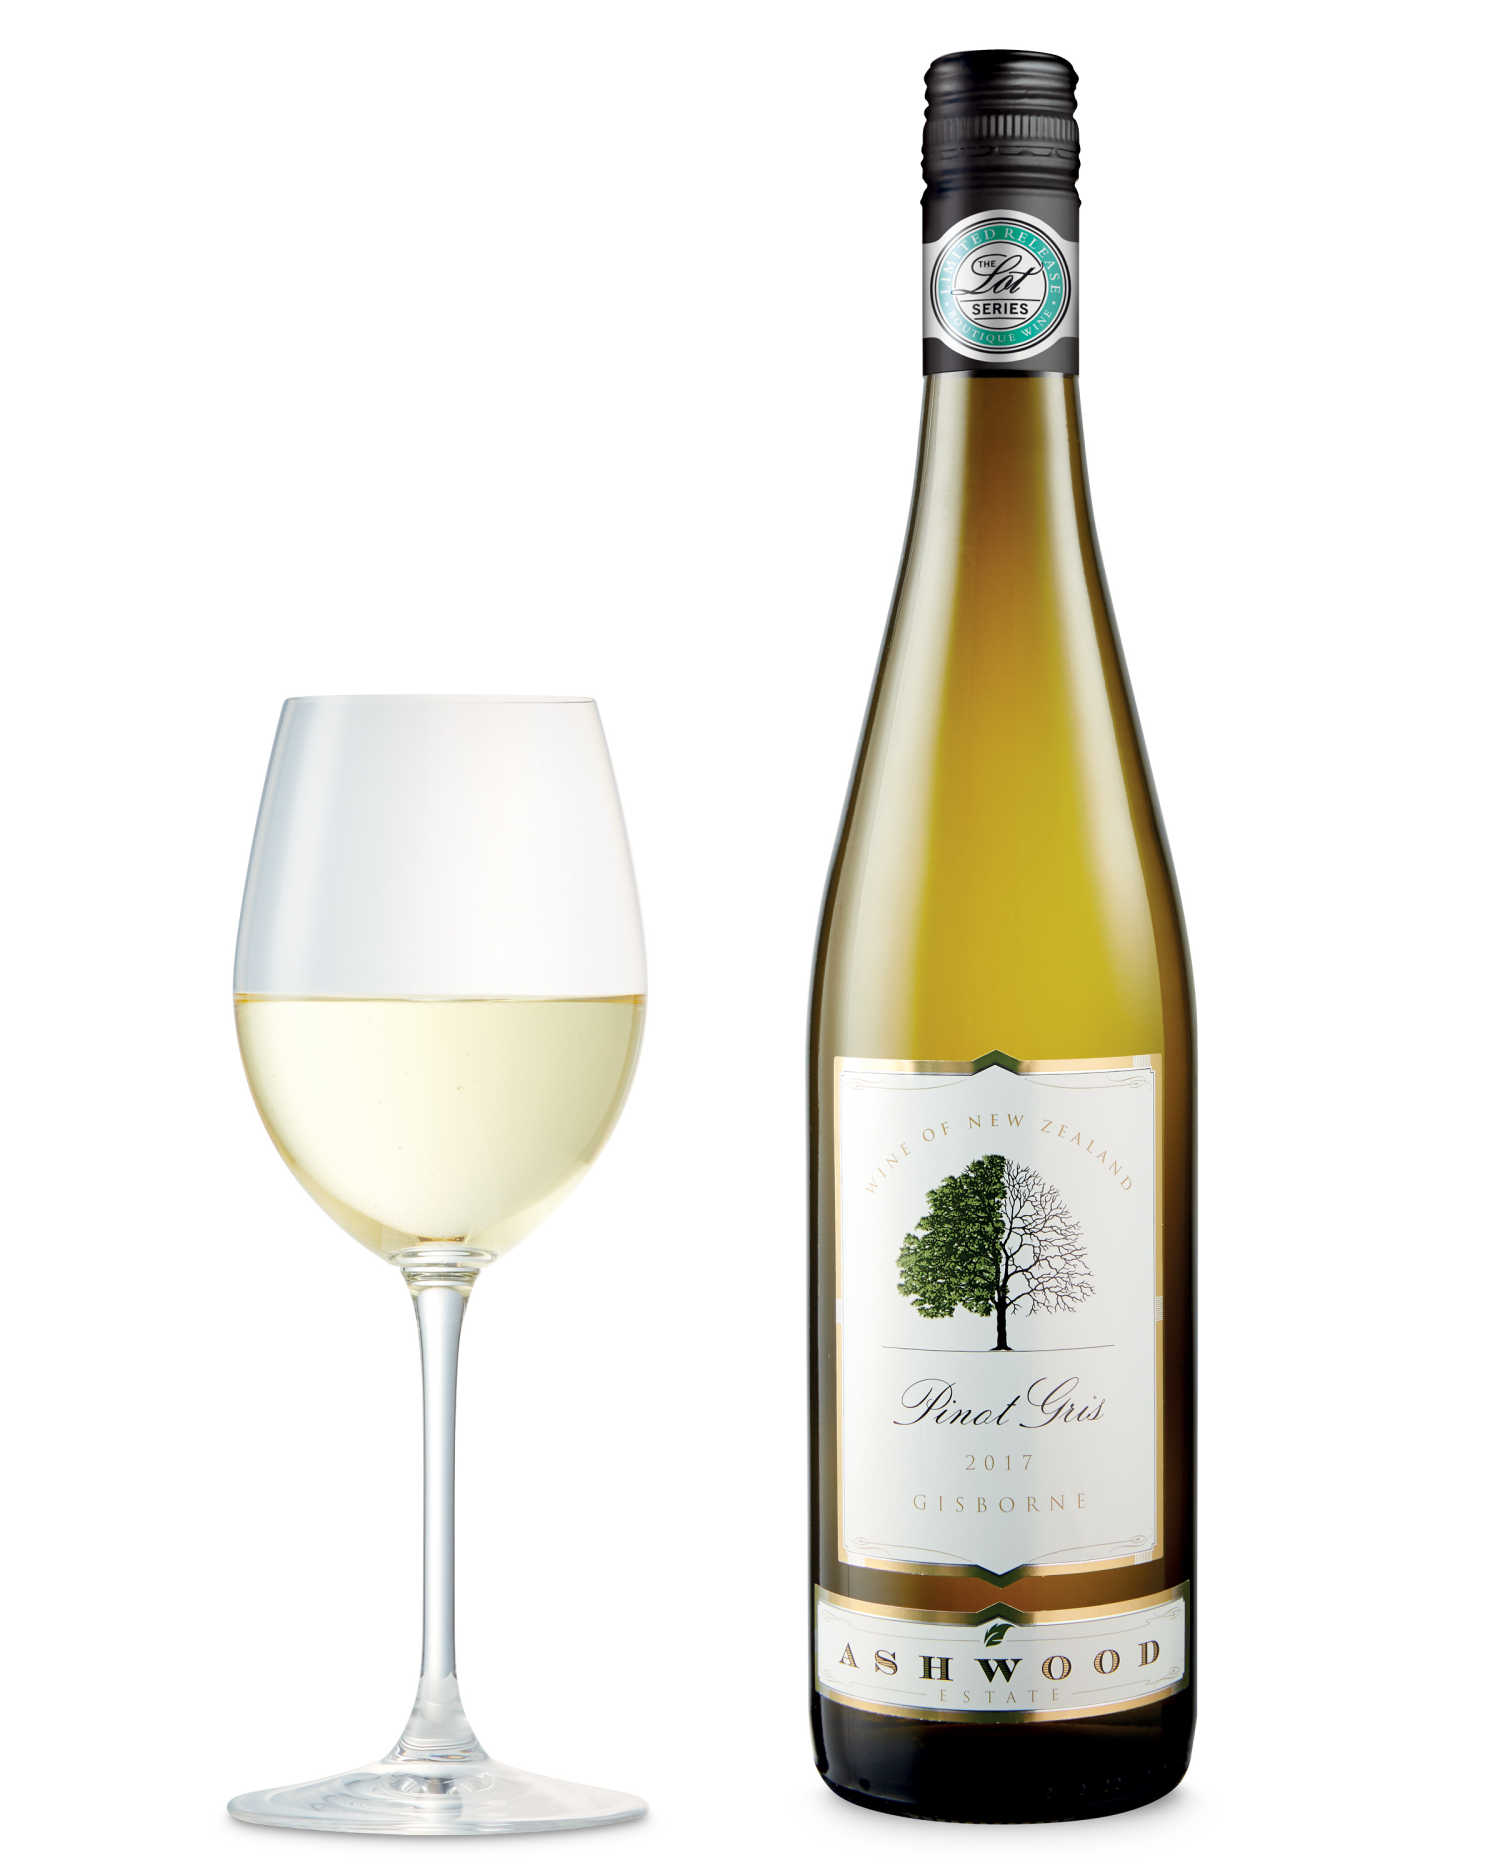 Gisborne Pinot Gris, Ashwood Estate, New Zealand 2017